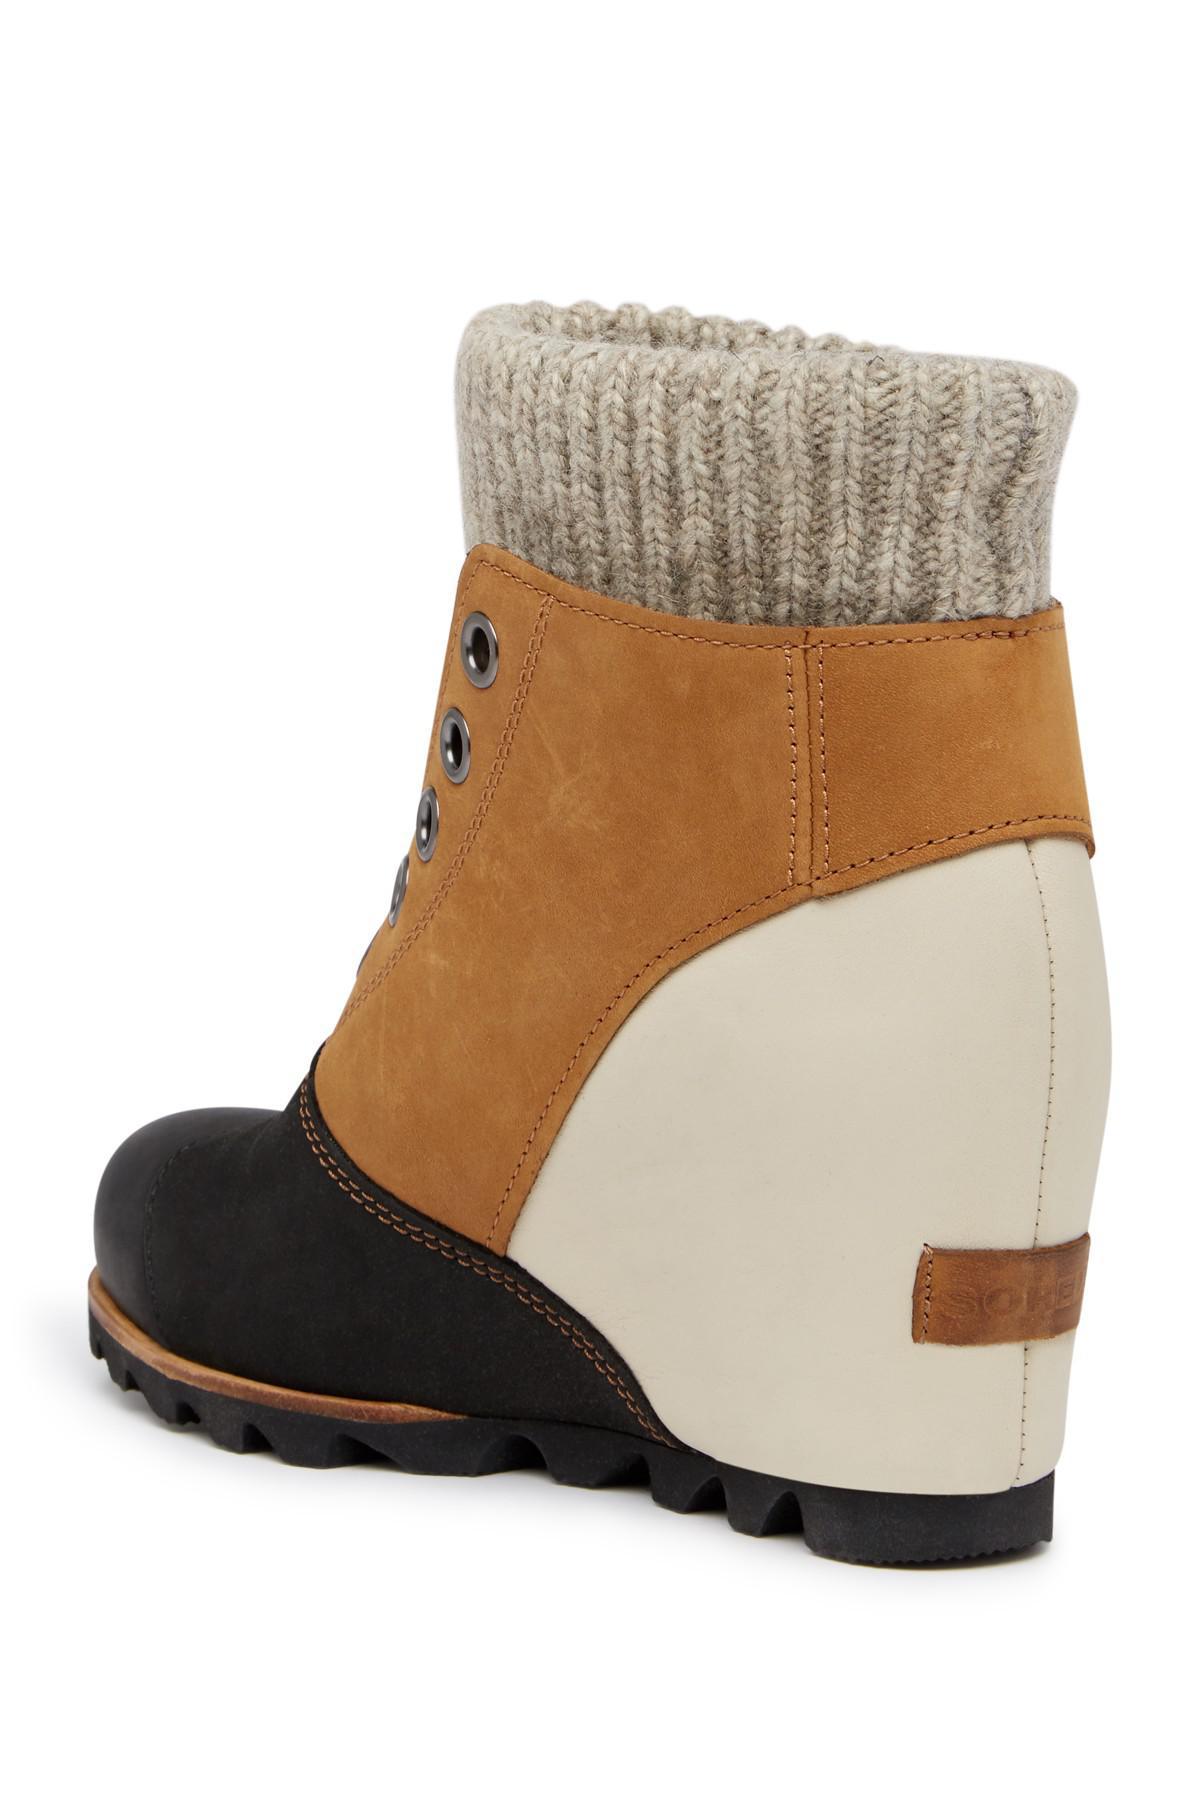 Lyst Sorel Joanie Sweater Sleek Waterproof Leather Wedge